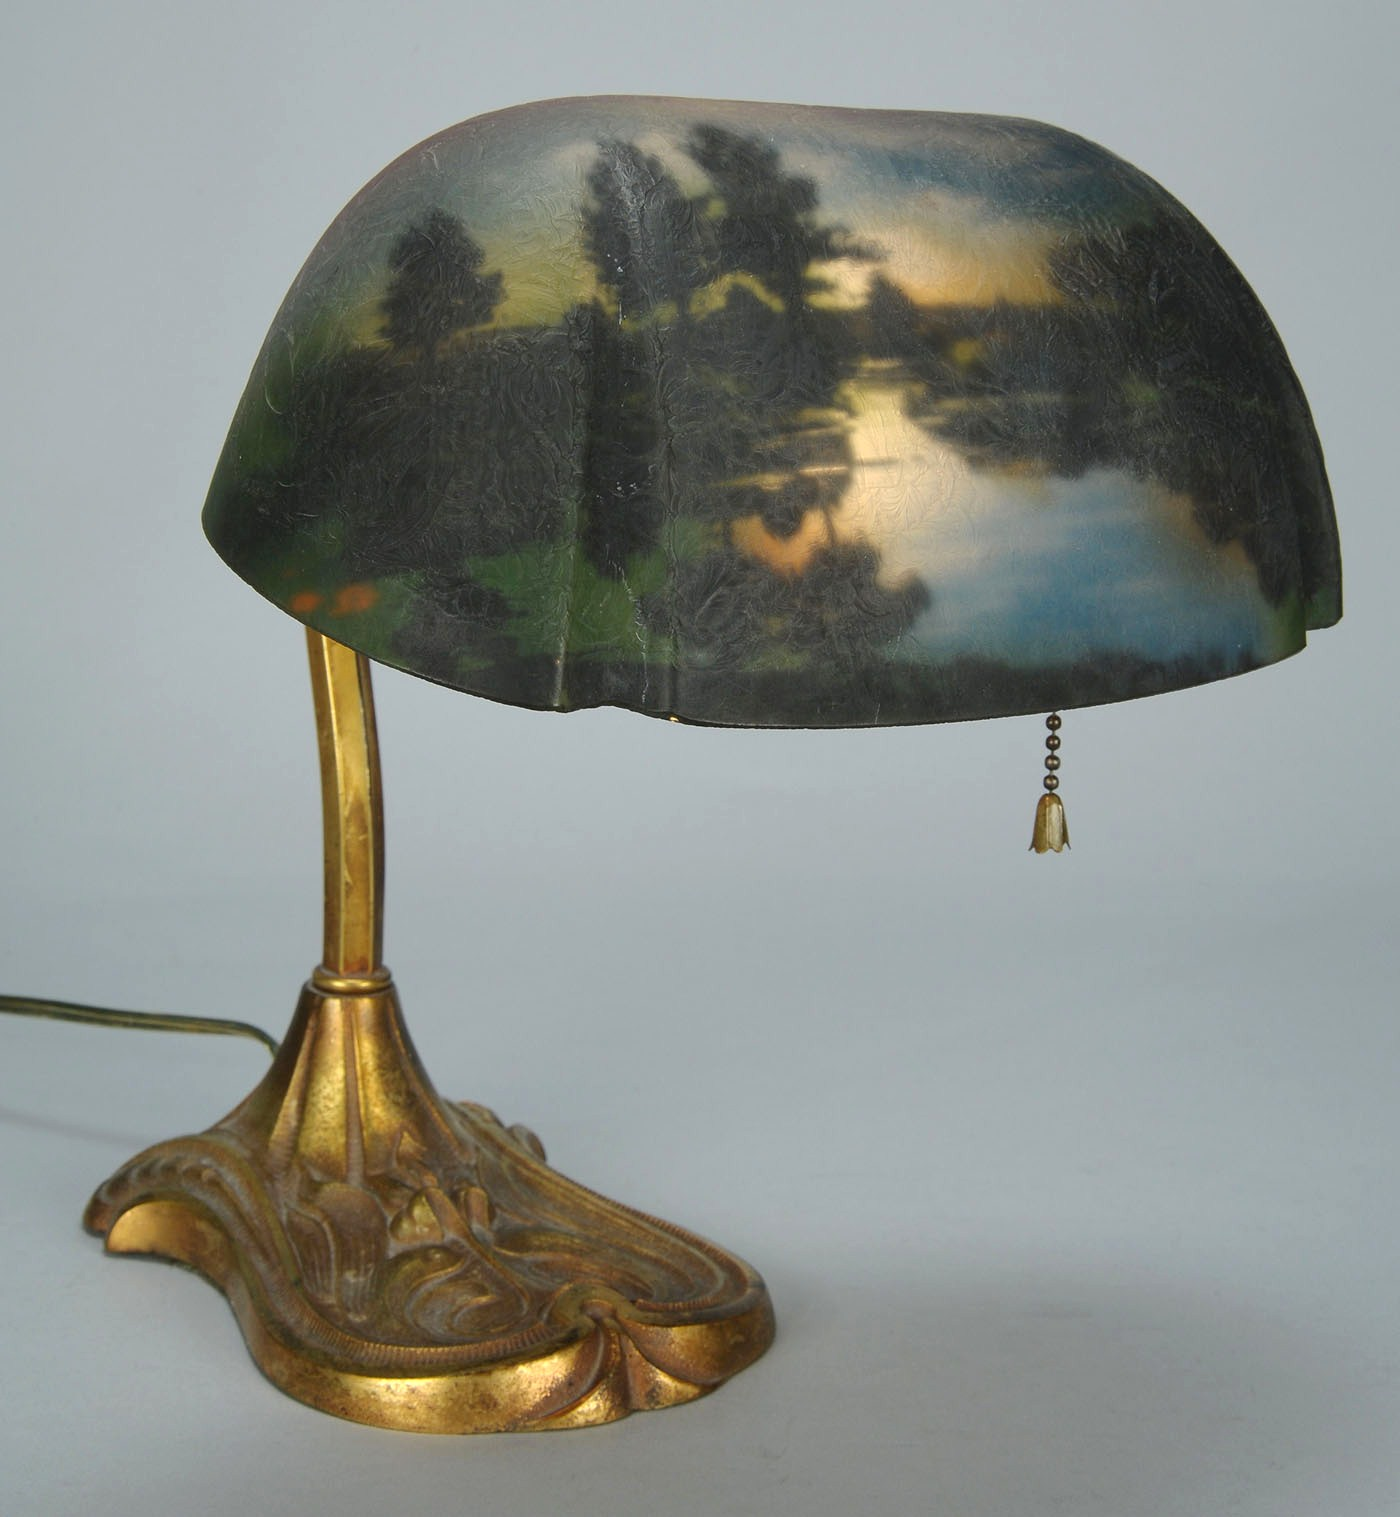 Lot 328 Pittsburgh Reverse Painted Desk Lamp 10 3 4 Quot H